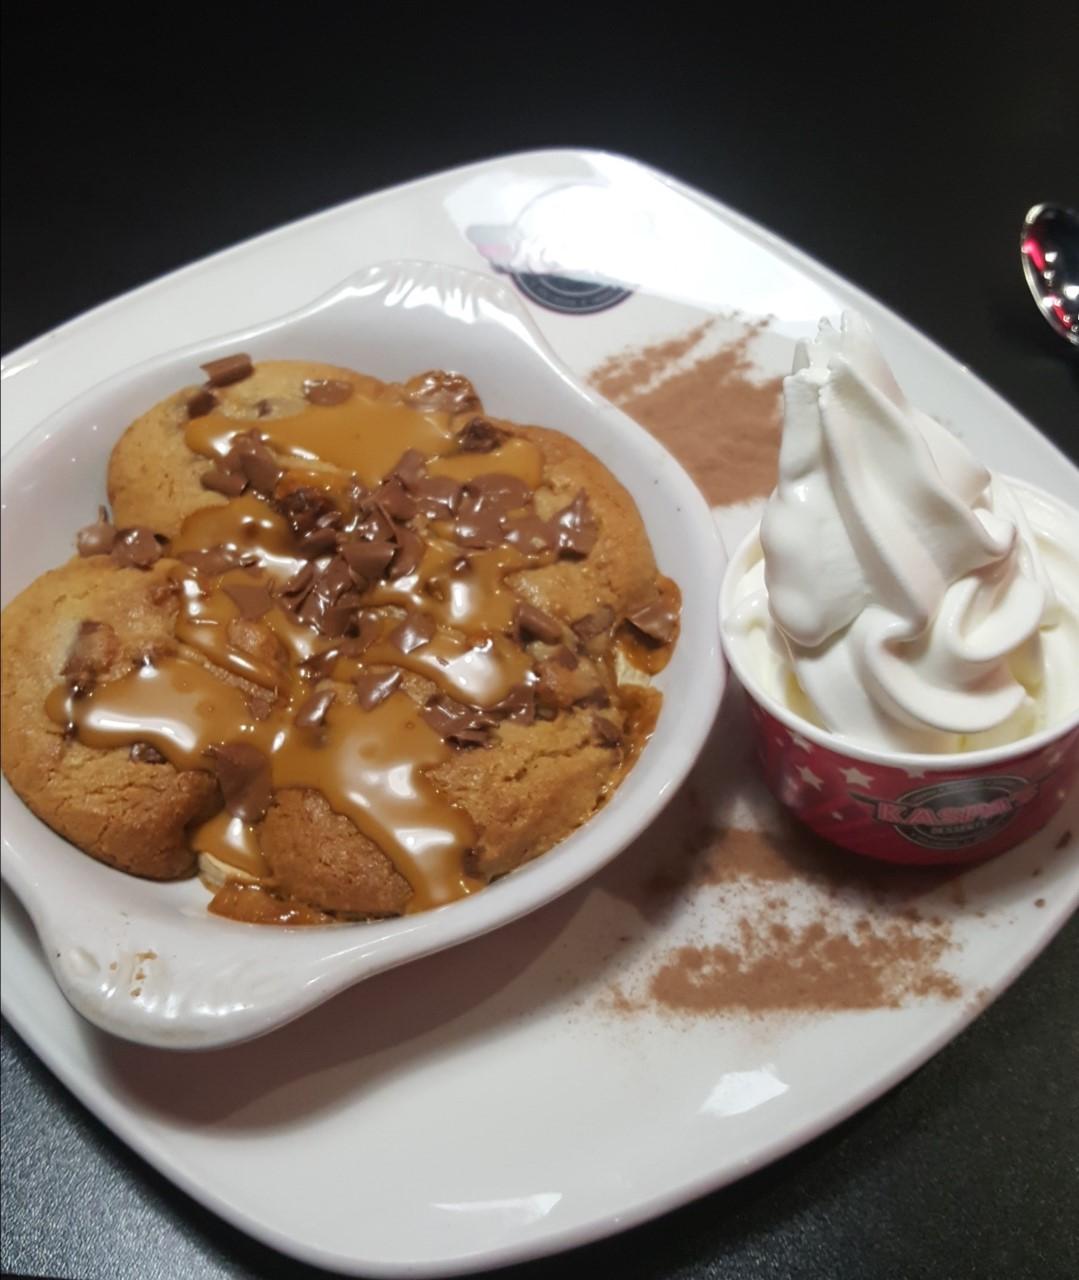 Trust Me Treats: Kaspa's UK Banoffee Cookie Dough review